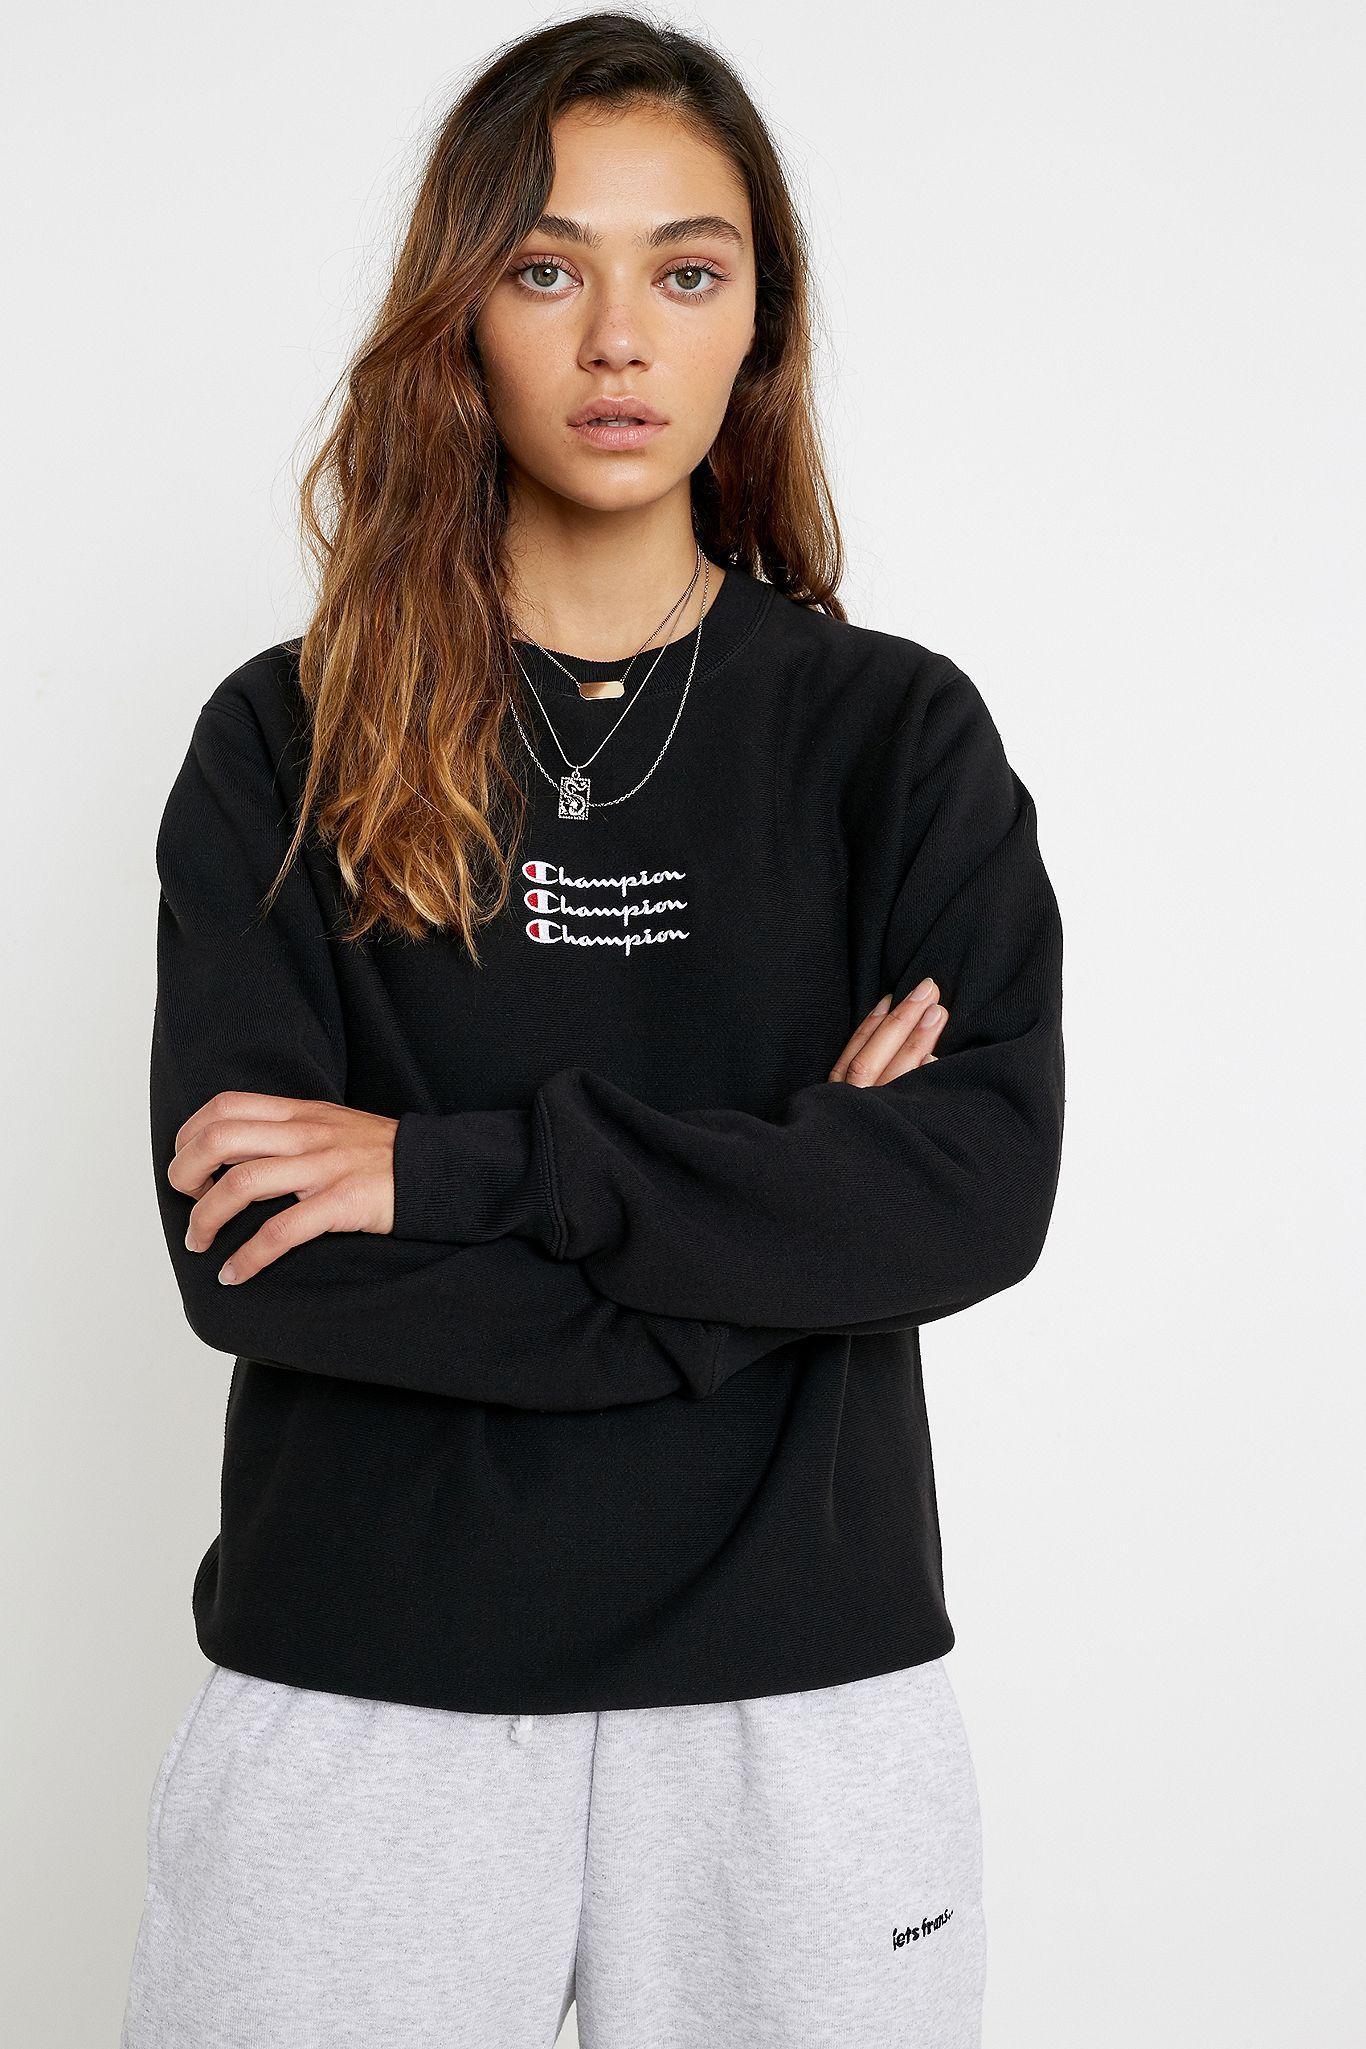 Champion Uo Exclusive Triple Script Logo Black Crew Neck Sweatshirt Urban Outfitters Uk Champion Clothing Crew Neck Sweatshirt Sweatshirts [ 2049 x 1366 Pixel ]